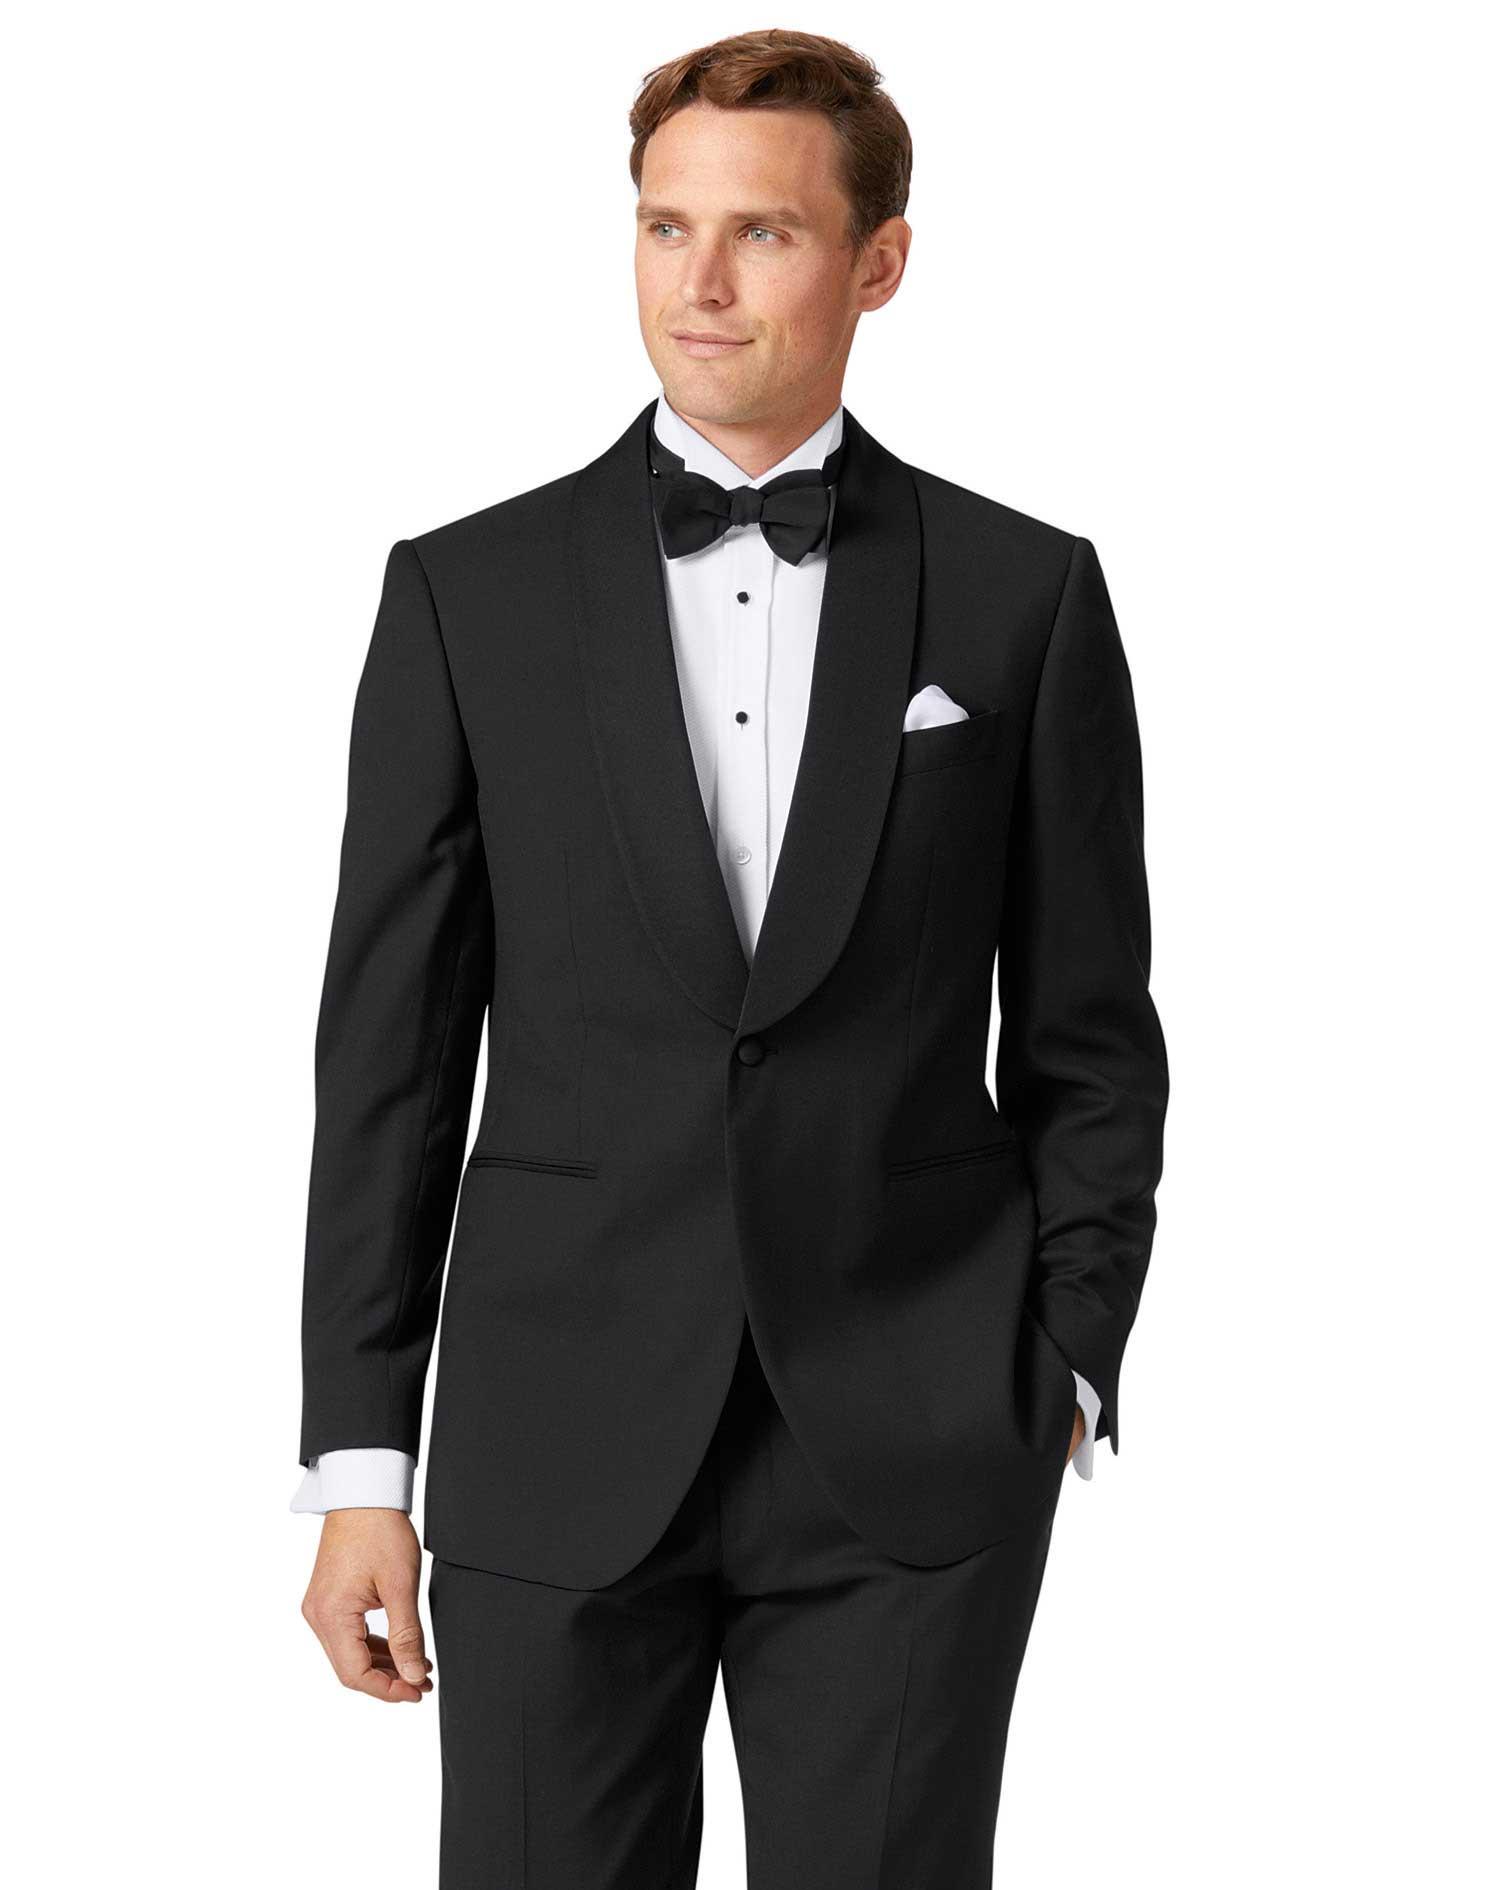 Black Slim Fit Shawl Collar Tuxedo Wool Jacket Size 36 Short by Charles Tyrwhitt